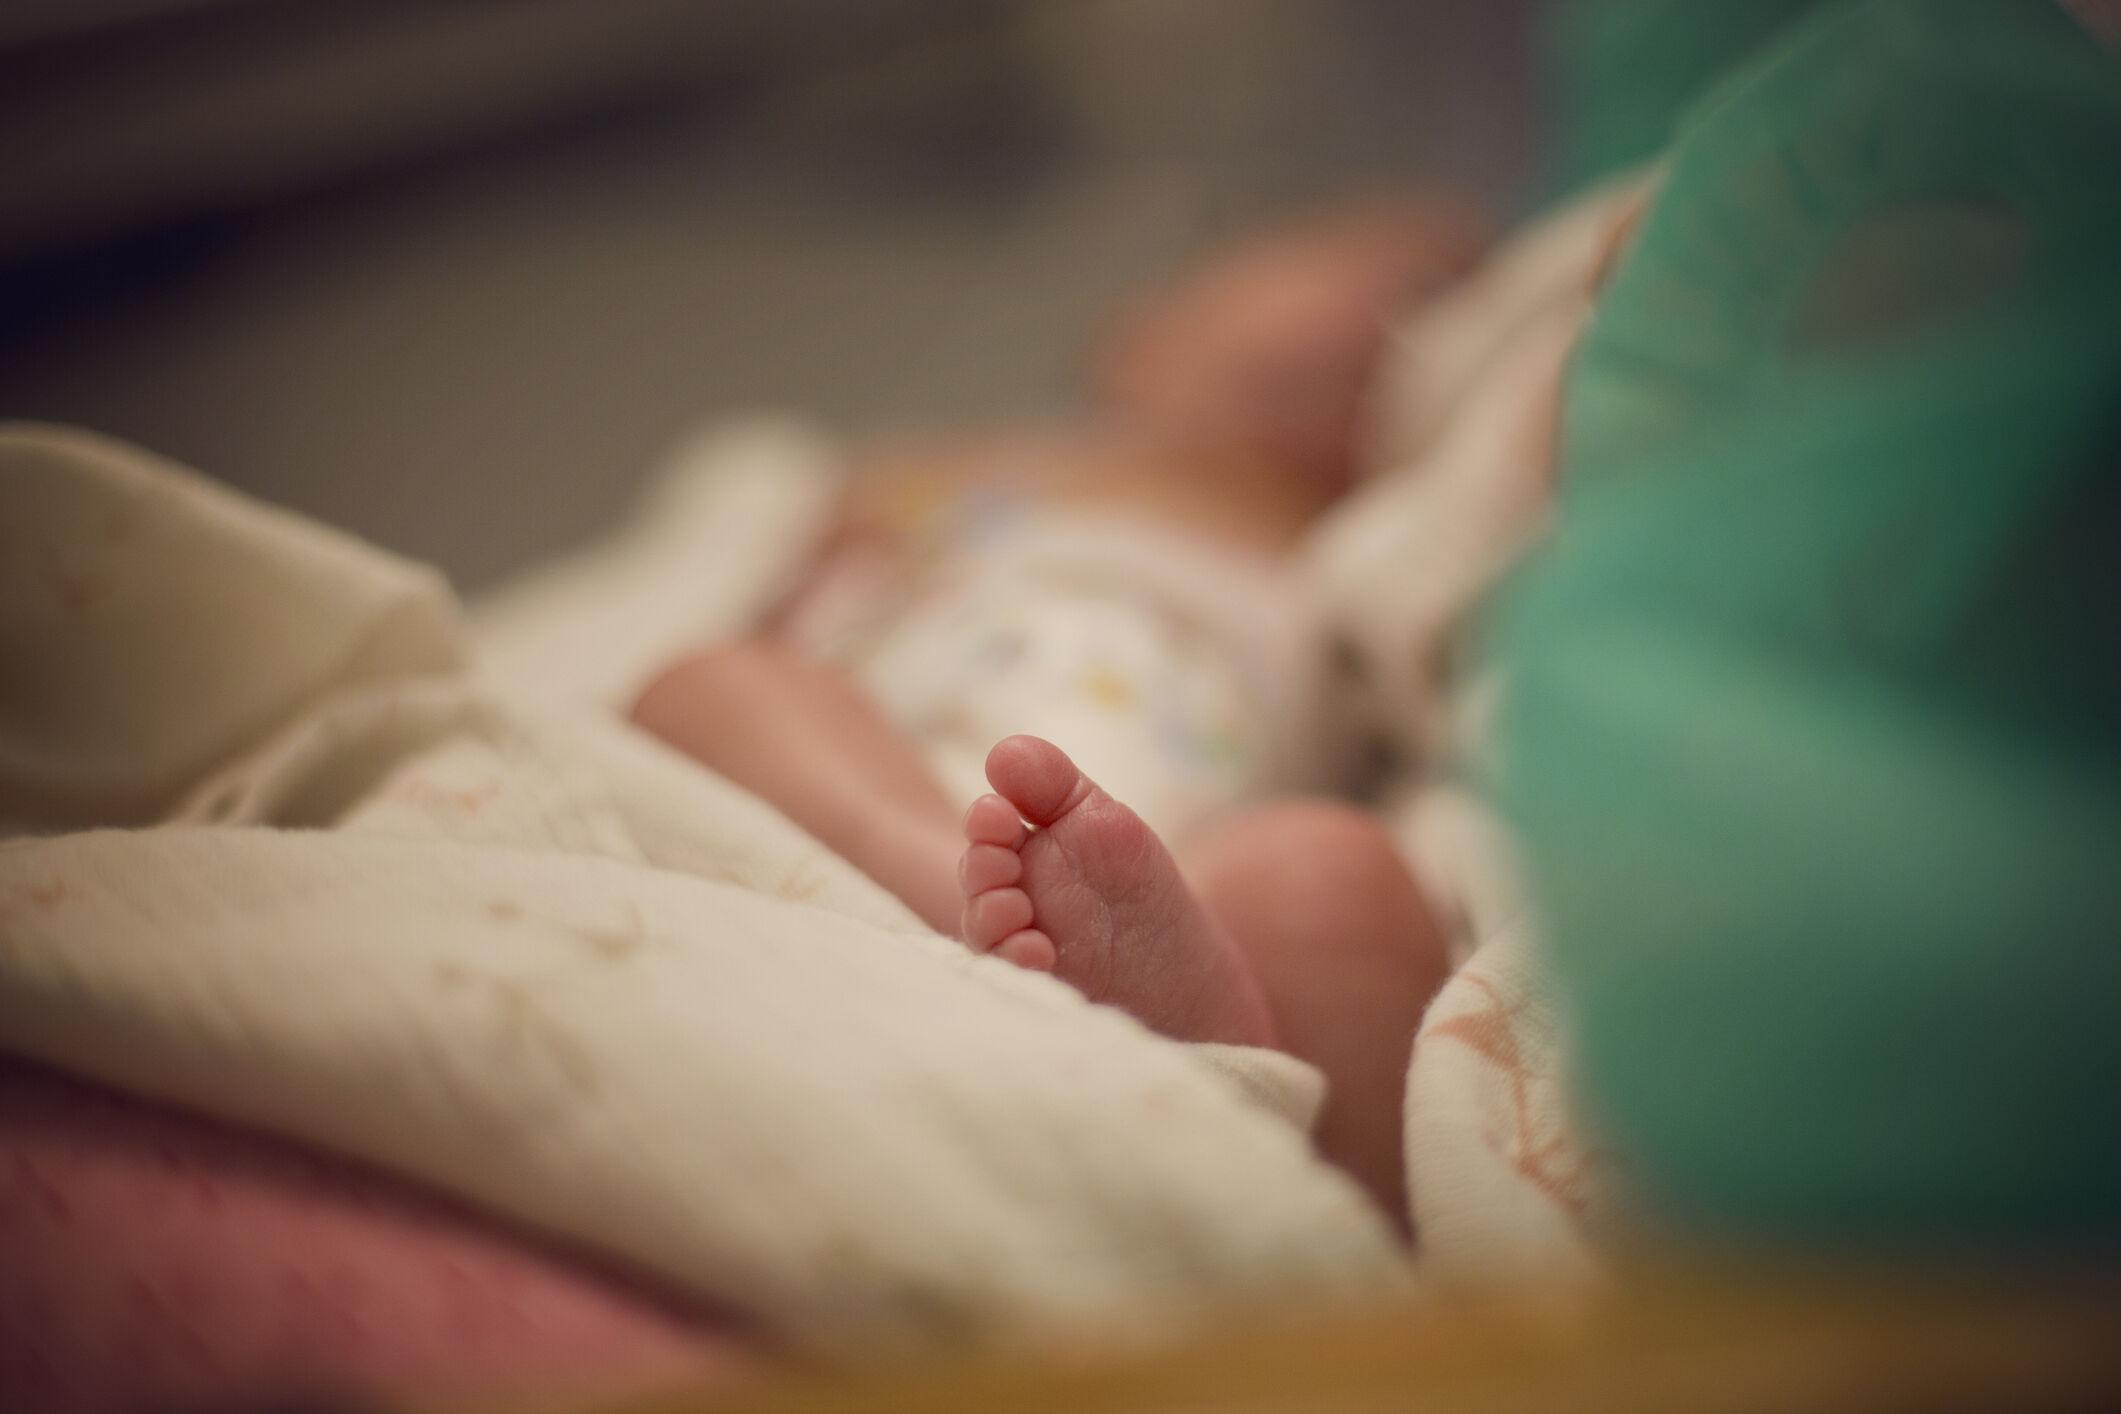 pe-bebe-recem-nascido-hospital